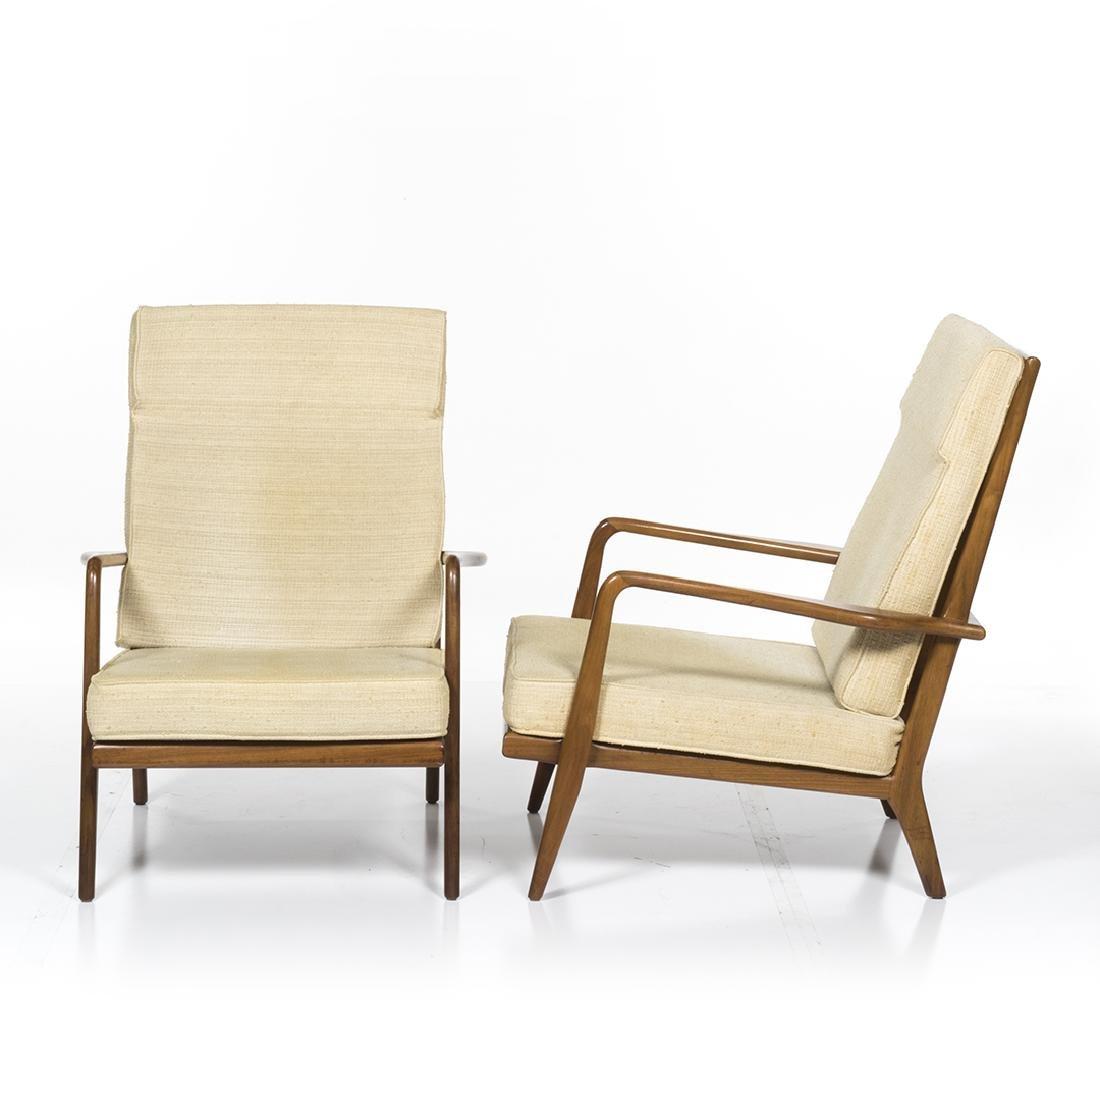 Mel Smilow Lounge Chairs (2) - 2